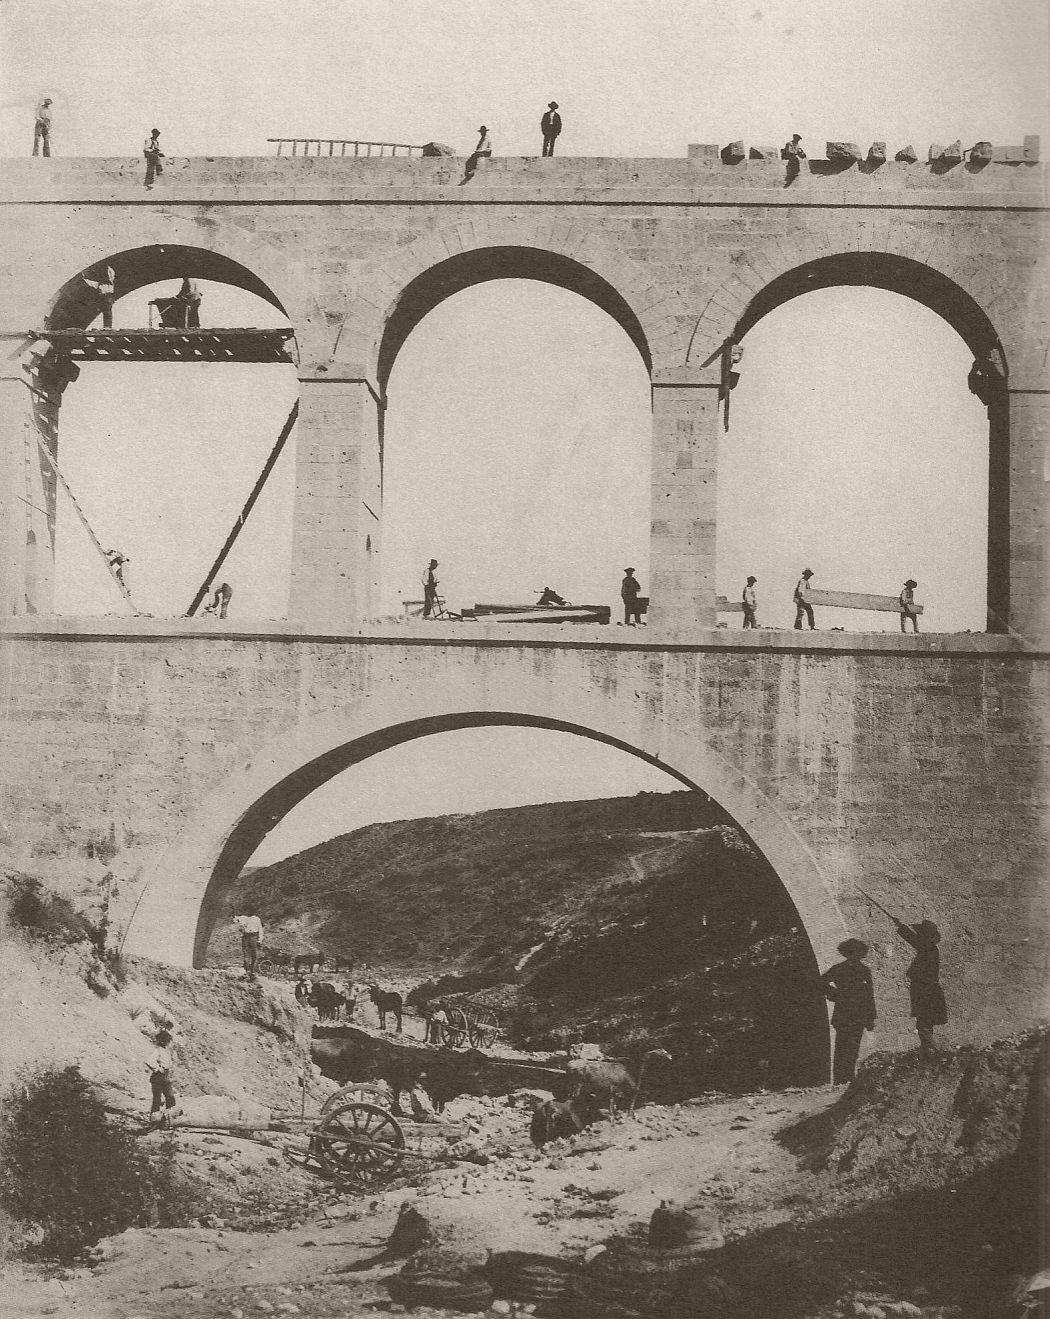 Obras del Canal de Isabel II: Acueducto de la Sima, Charles Clifford, 1855.